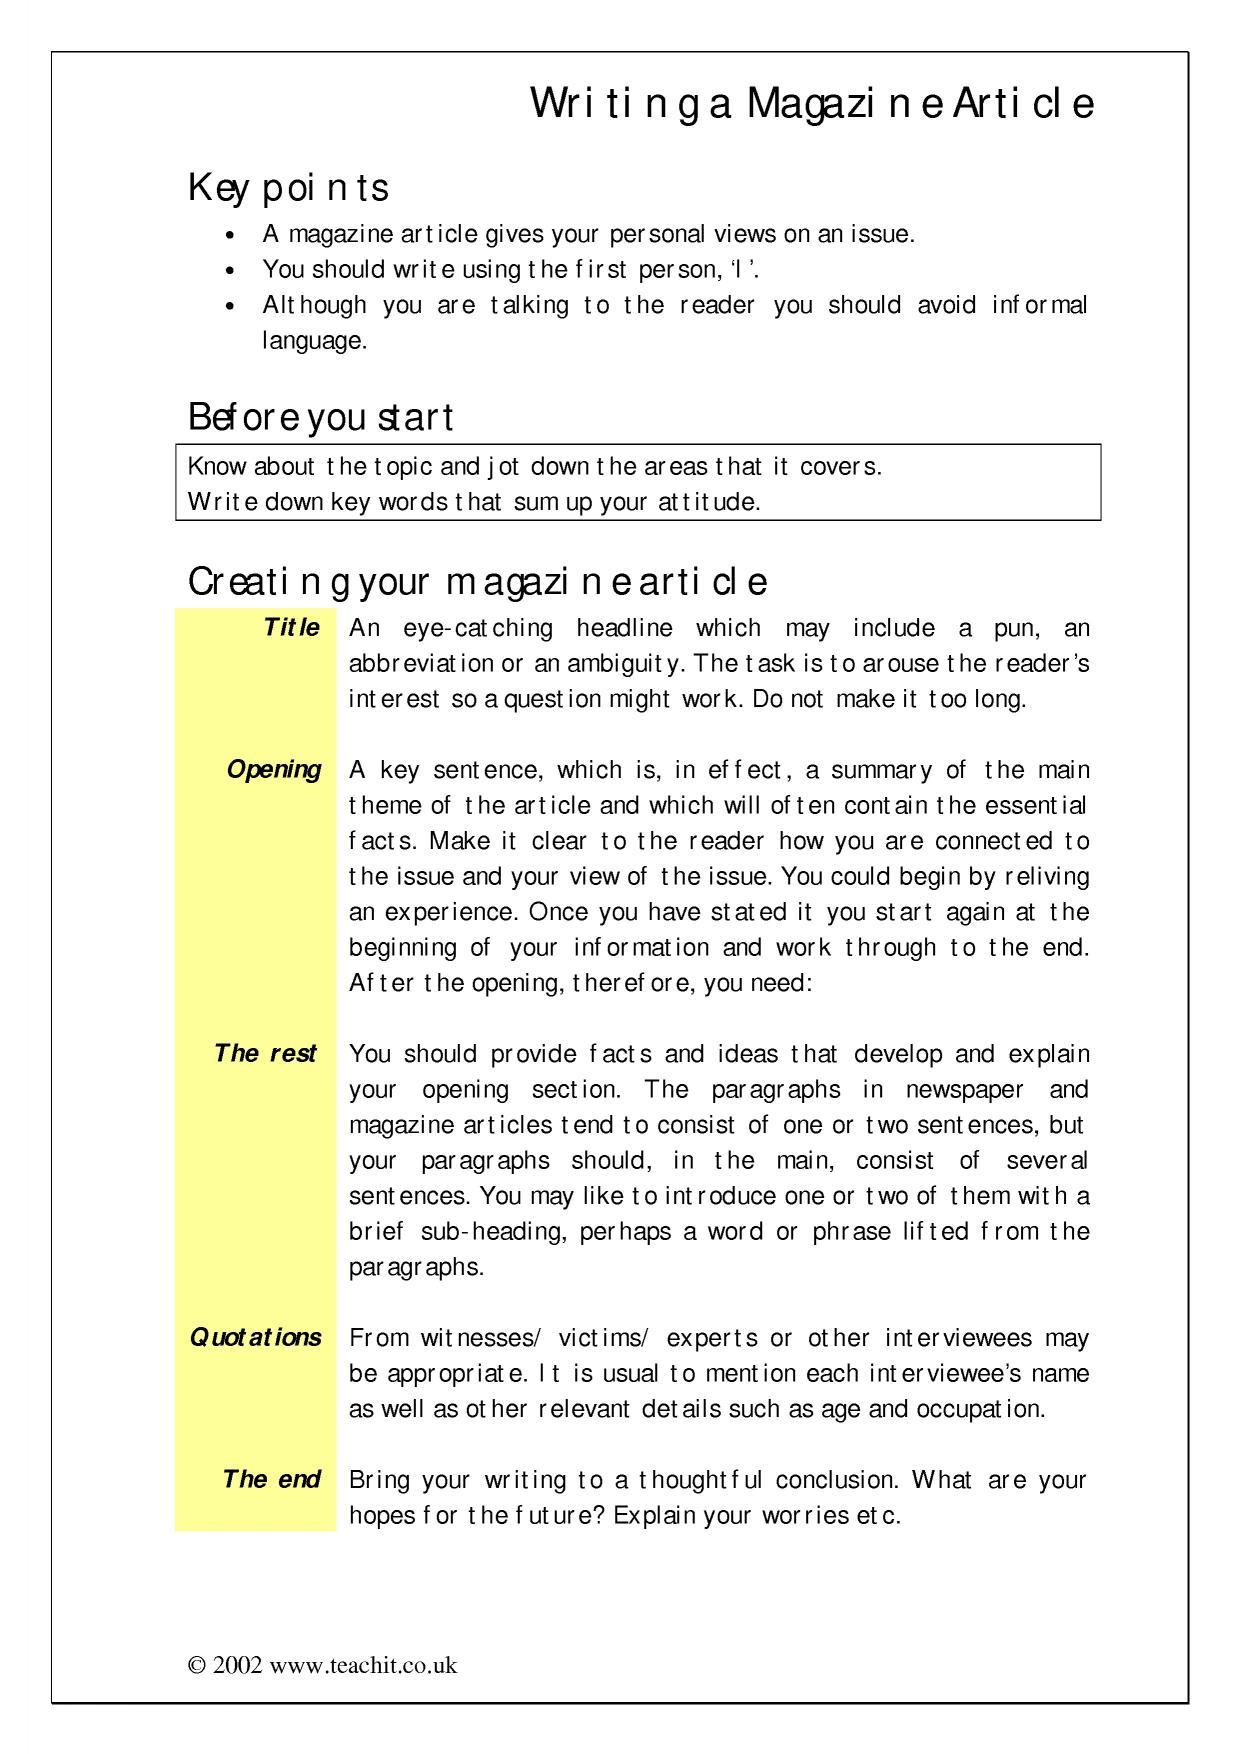 how to write a magazine article gcse english